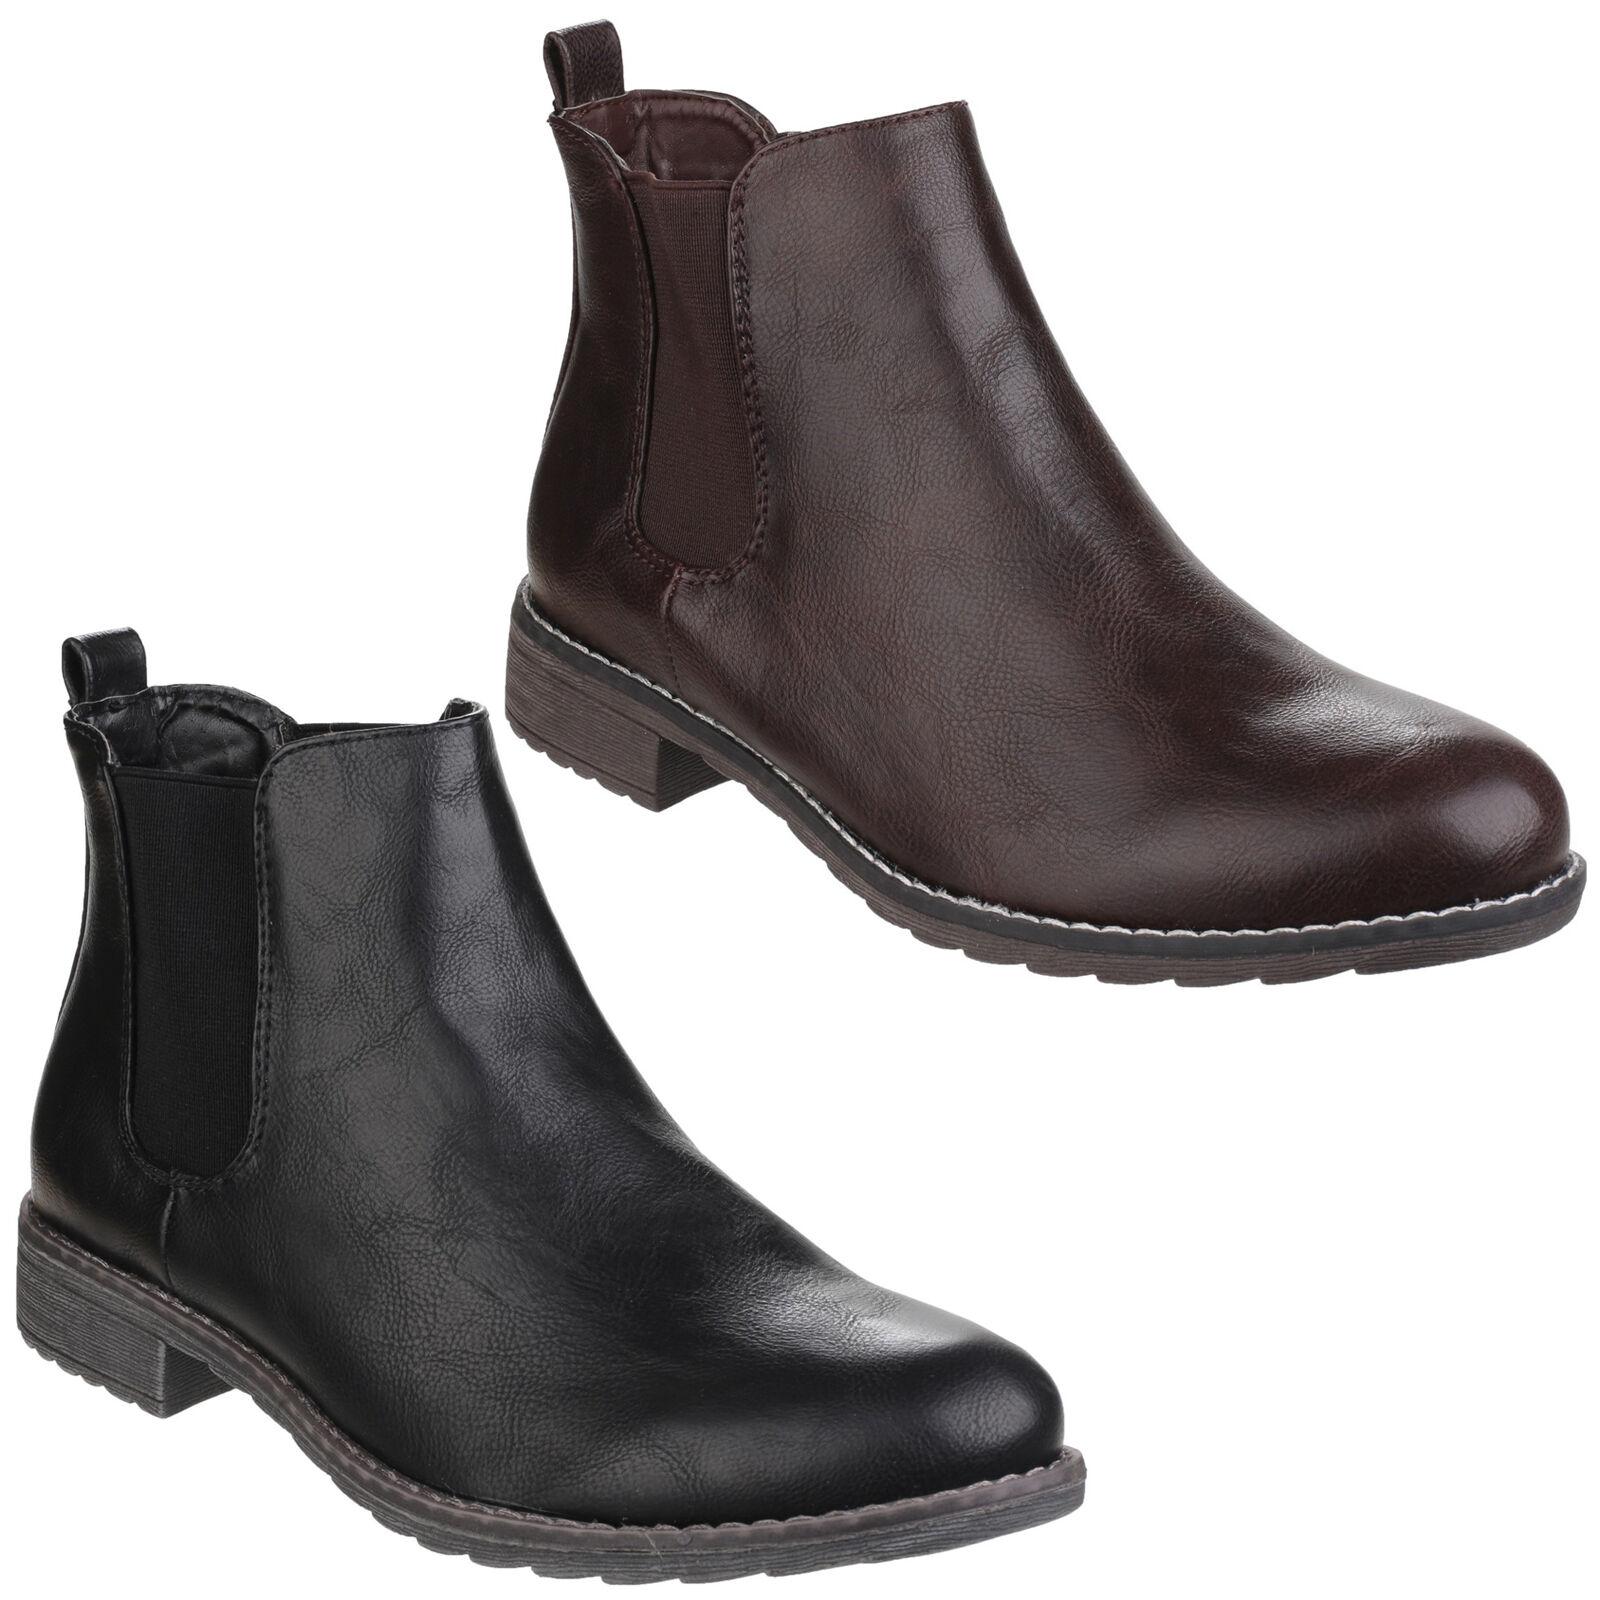 52c6defb80e17 Divaz Kelly Ankle Chelsea Slip On Womens Heel Fashion Derby Boots Shoes  UK3-8